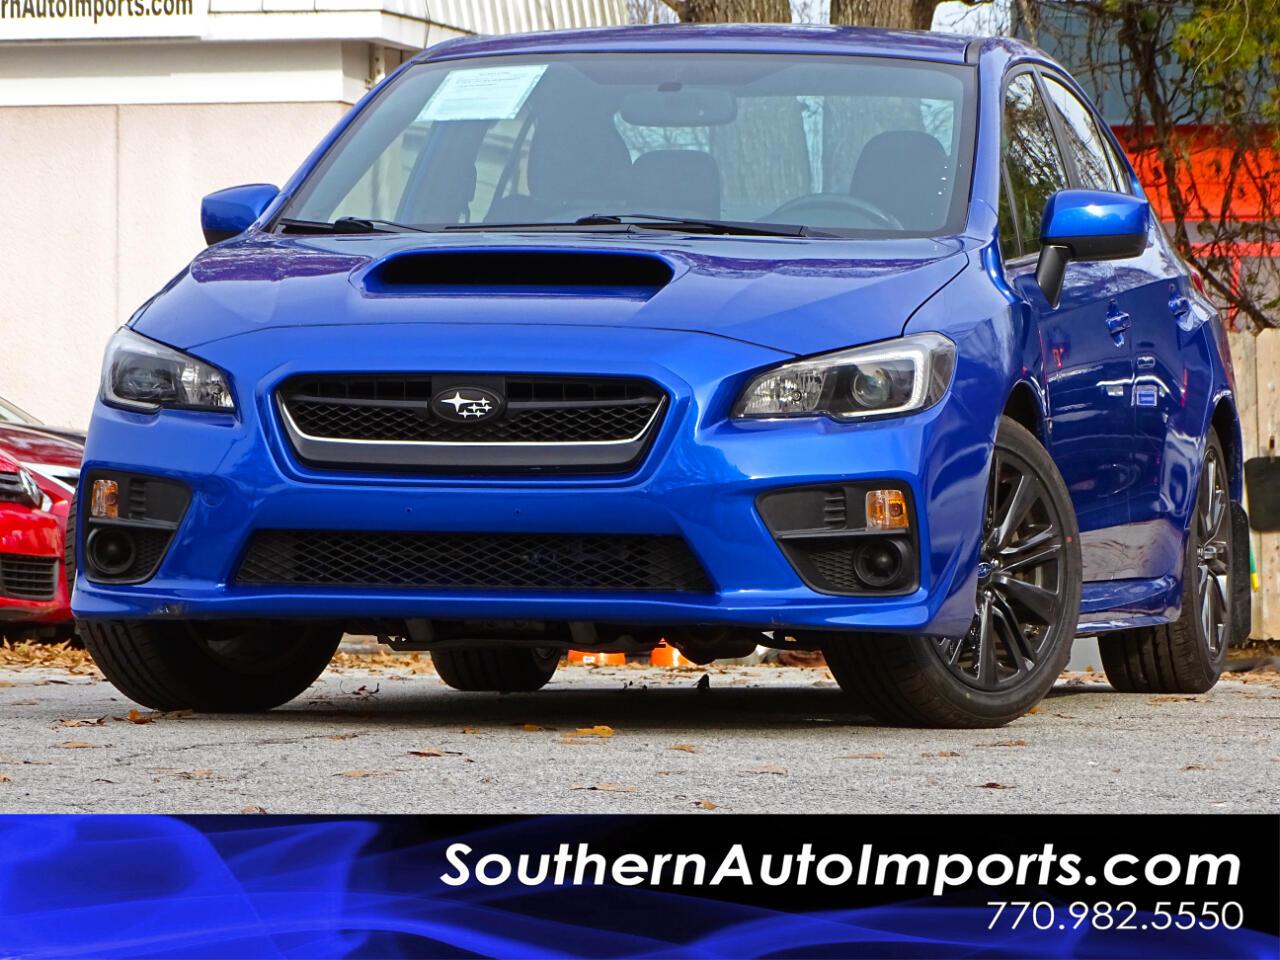 2016 Subaru WRX 4dr Sdn Man